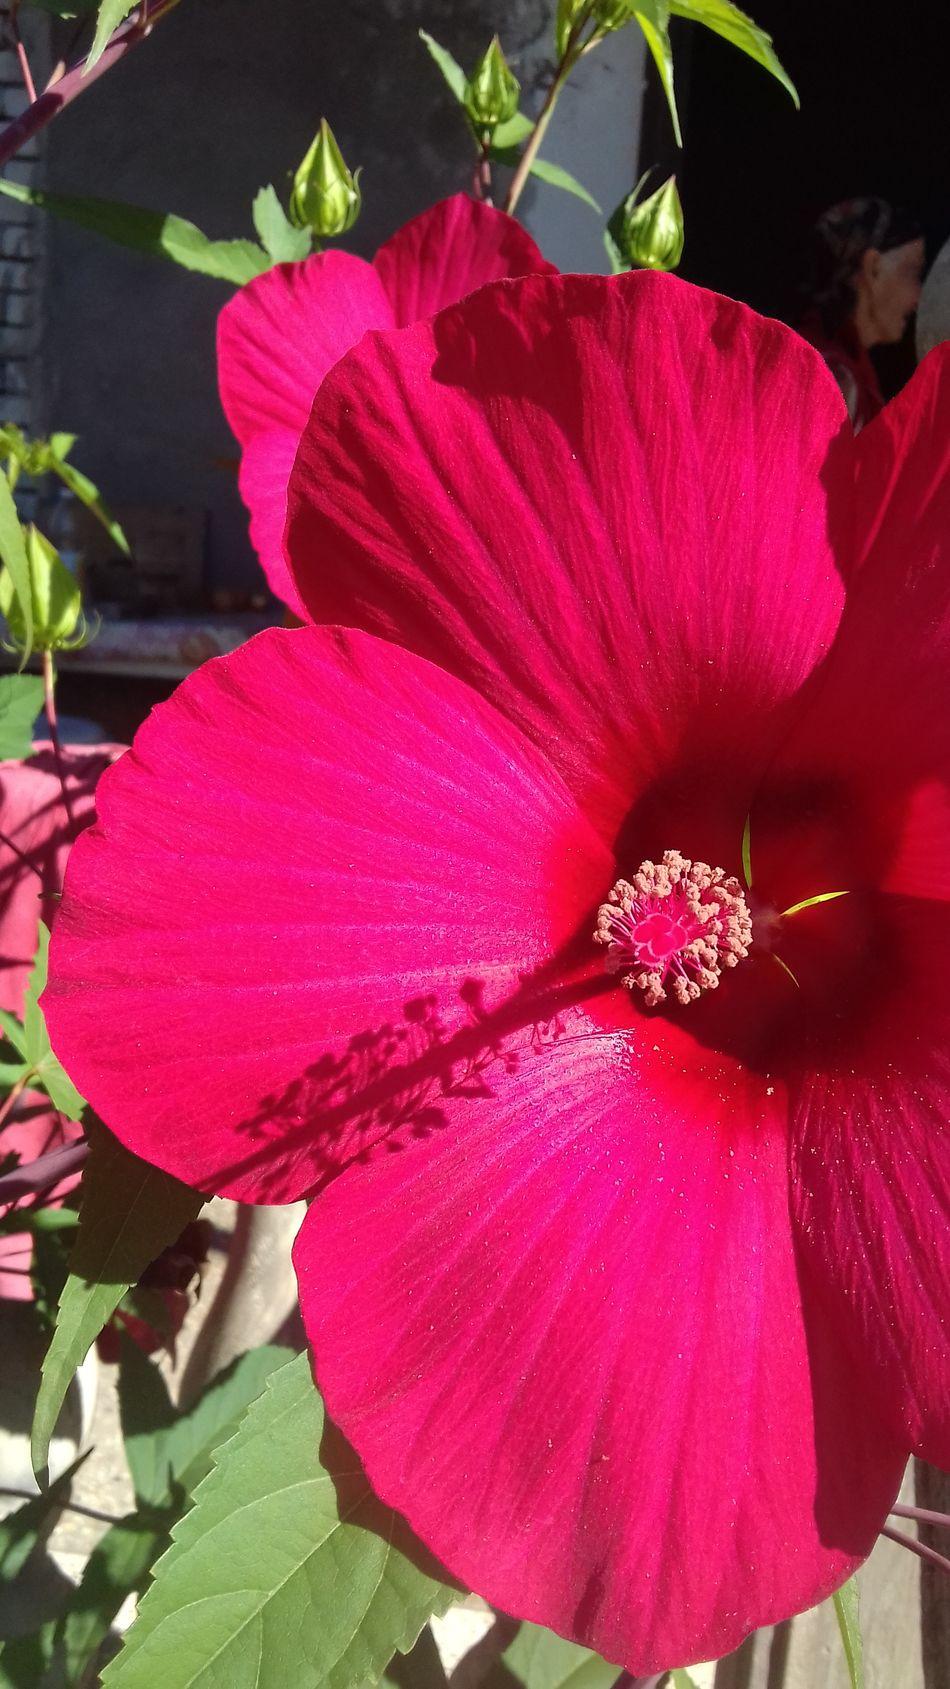 Samsungphotography Photography Mobilephotography Mobile Photography Hello World Good Times საქართველო♥ Flowers Flowers, Nature And Beauty Beautiful Day Kutaisi ქუთაისი Georgia Saqartvelo Suny Day ☀️ Suny Day Sunyday🌞